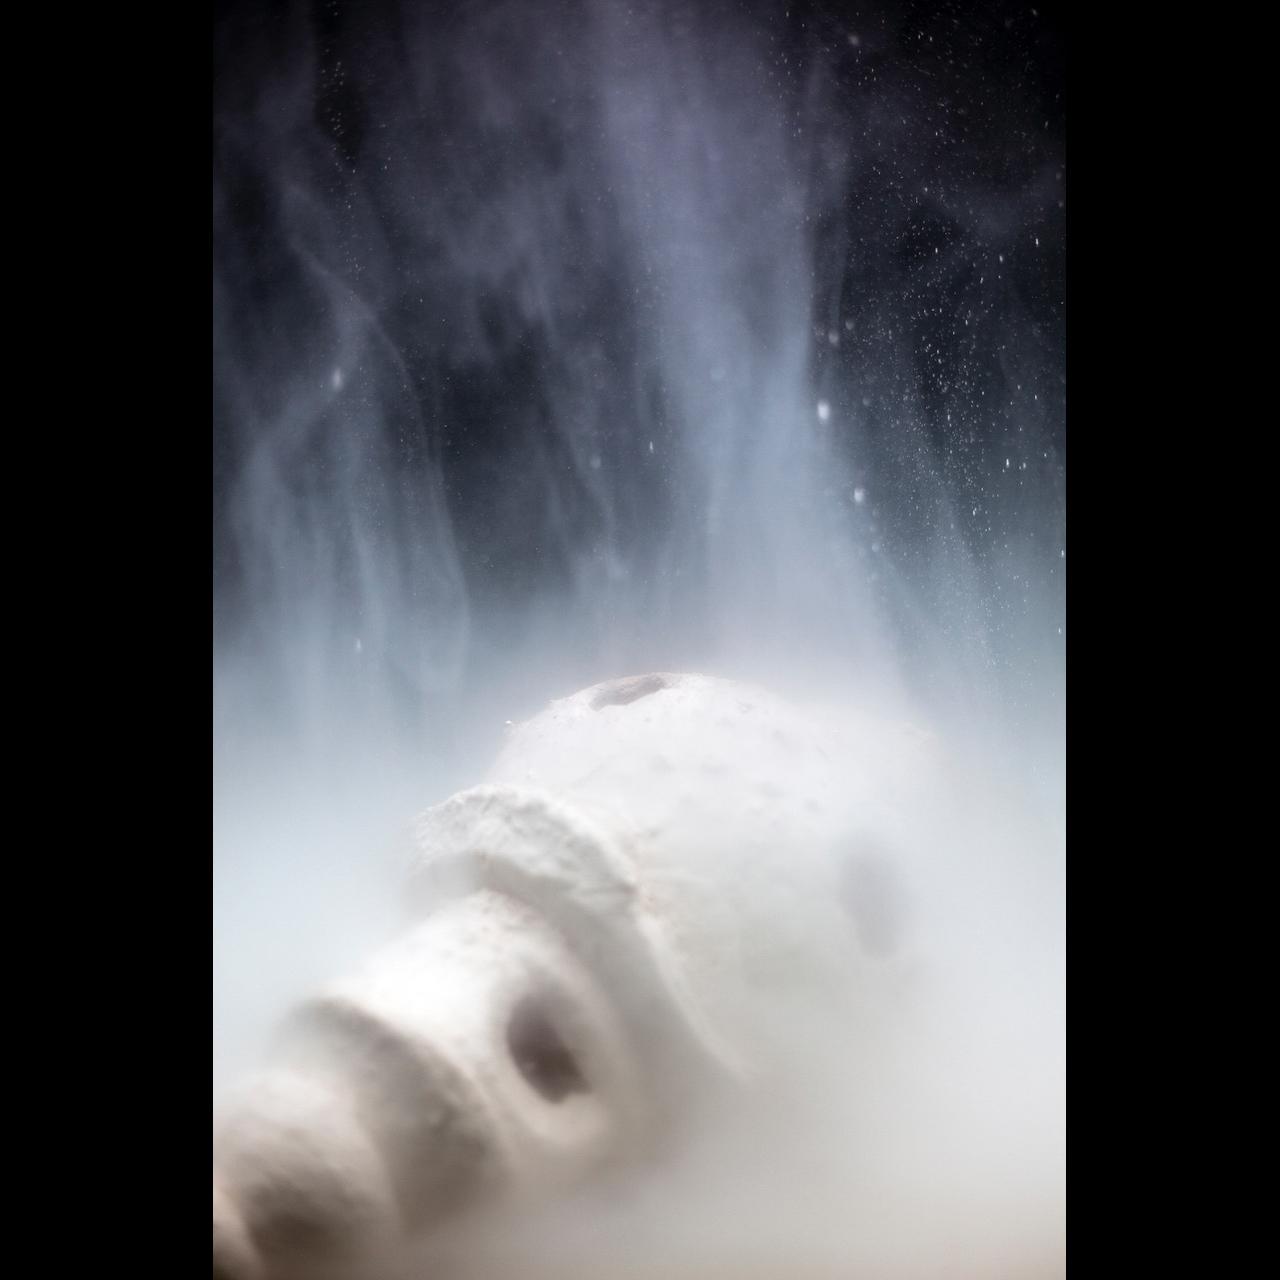 Cyrus Tang,  Stupa  (Still), 2017, 3 channel video in loop, 6.14 mins.